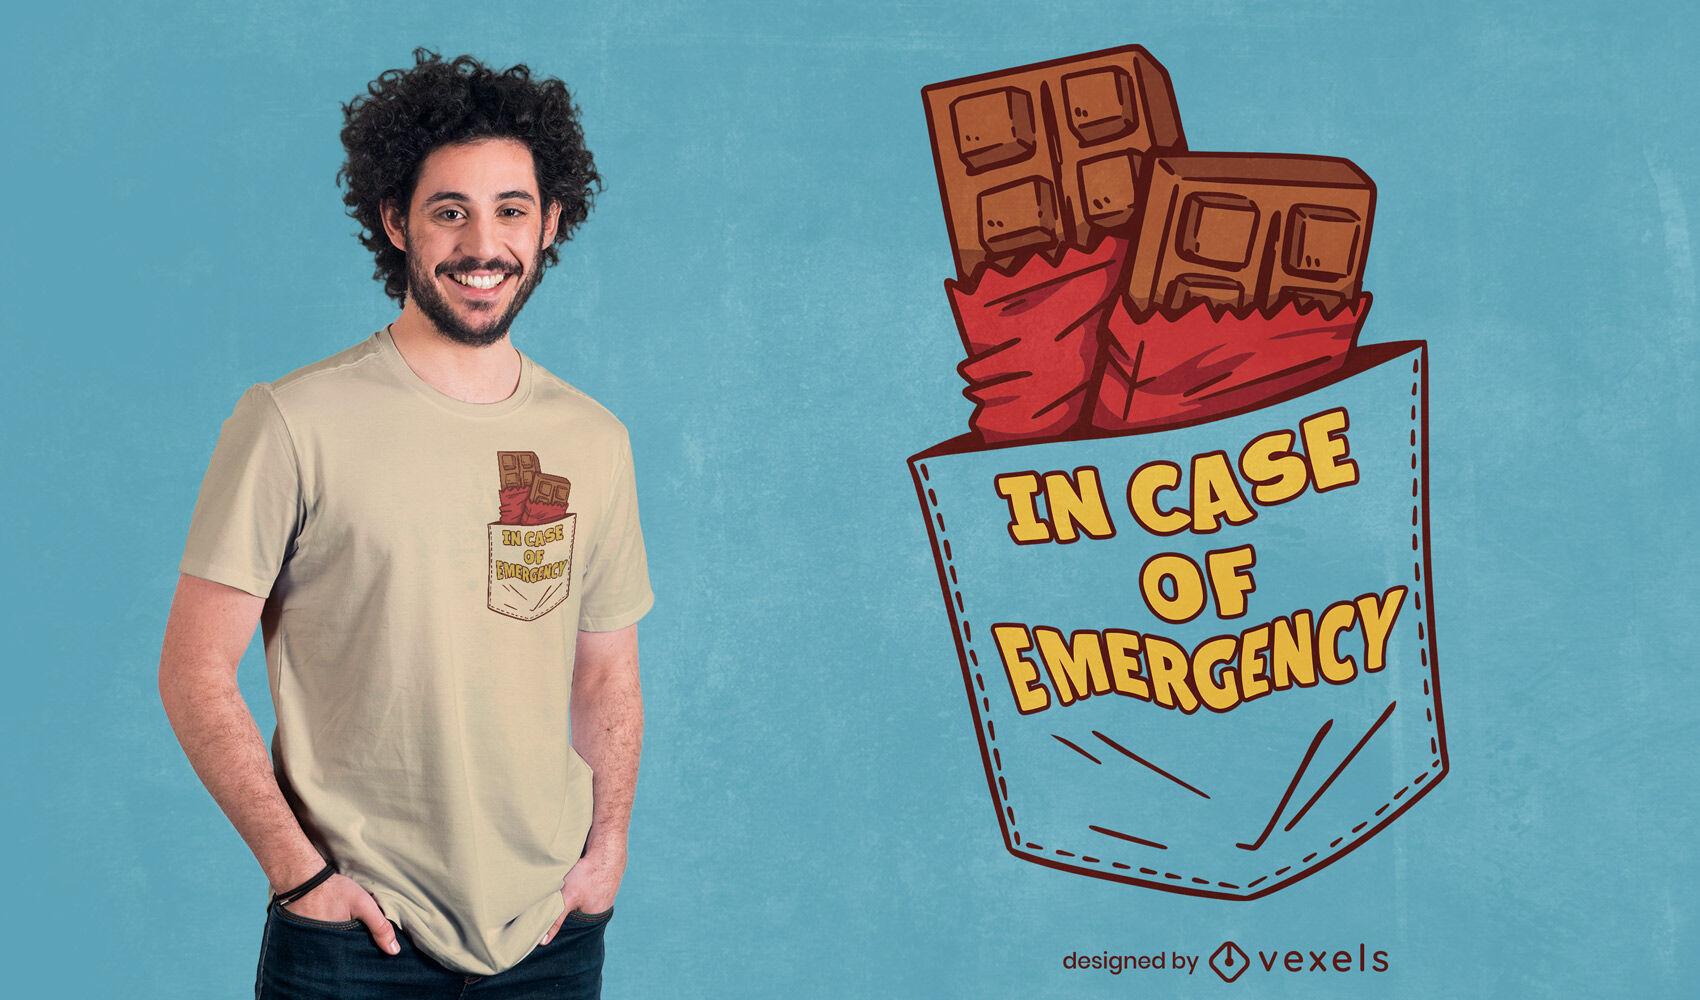 Emergency chocolate bar t-shirt design